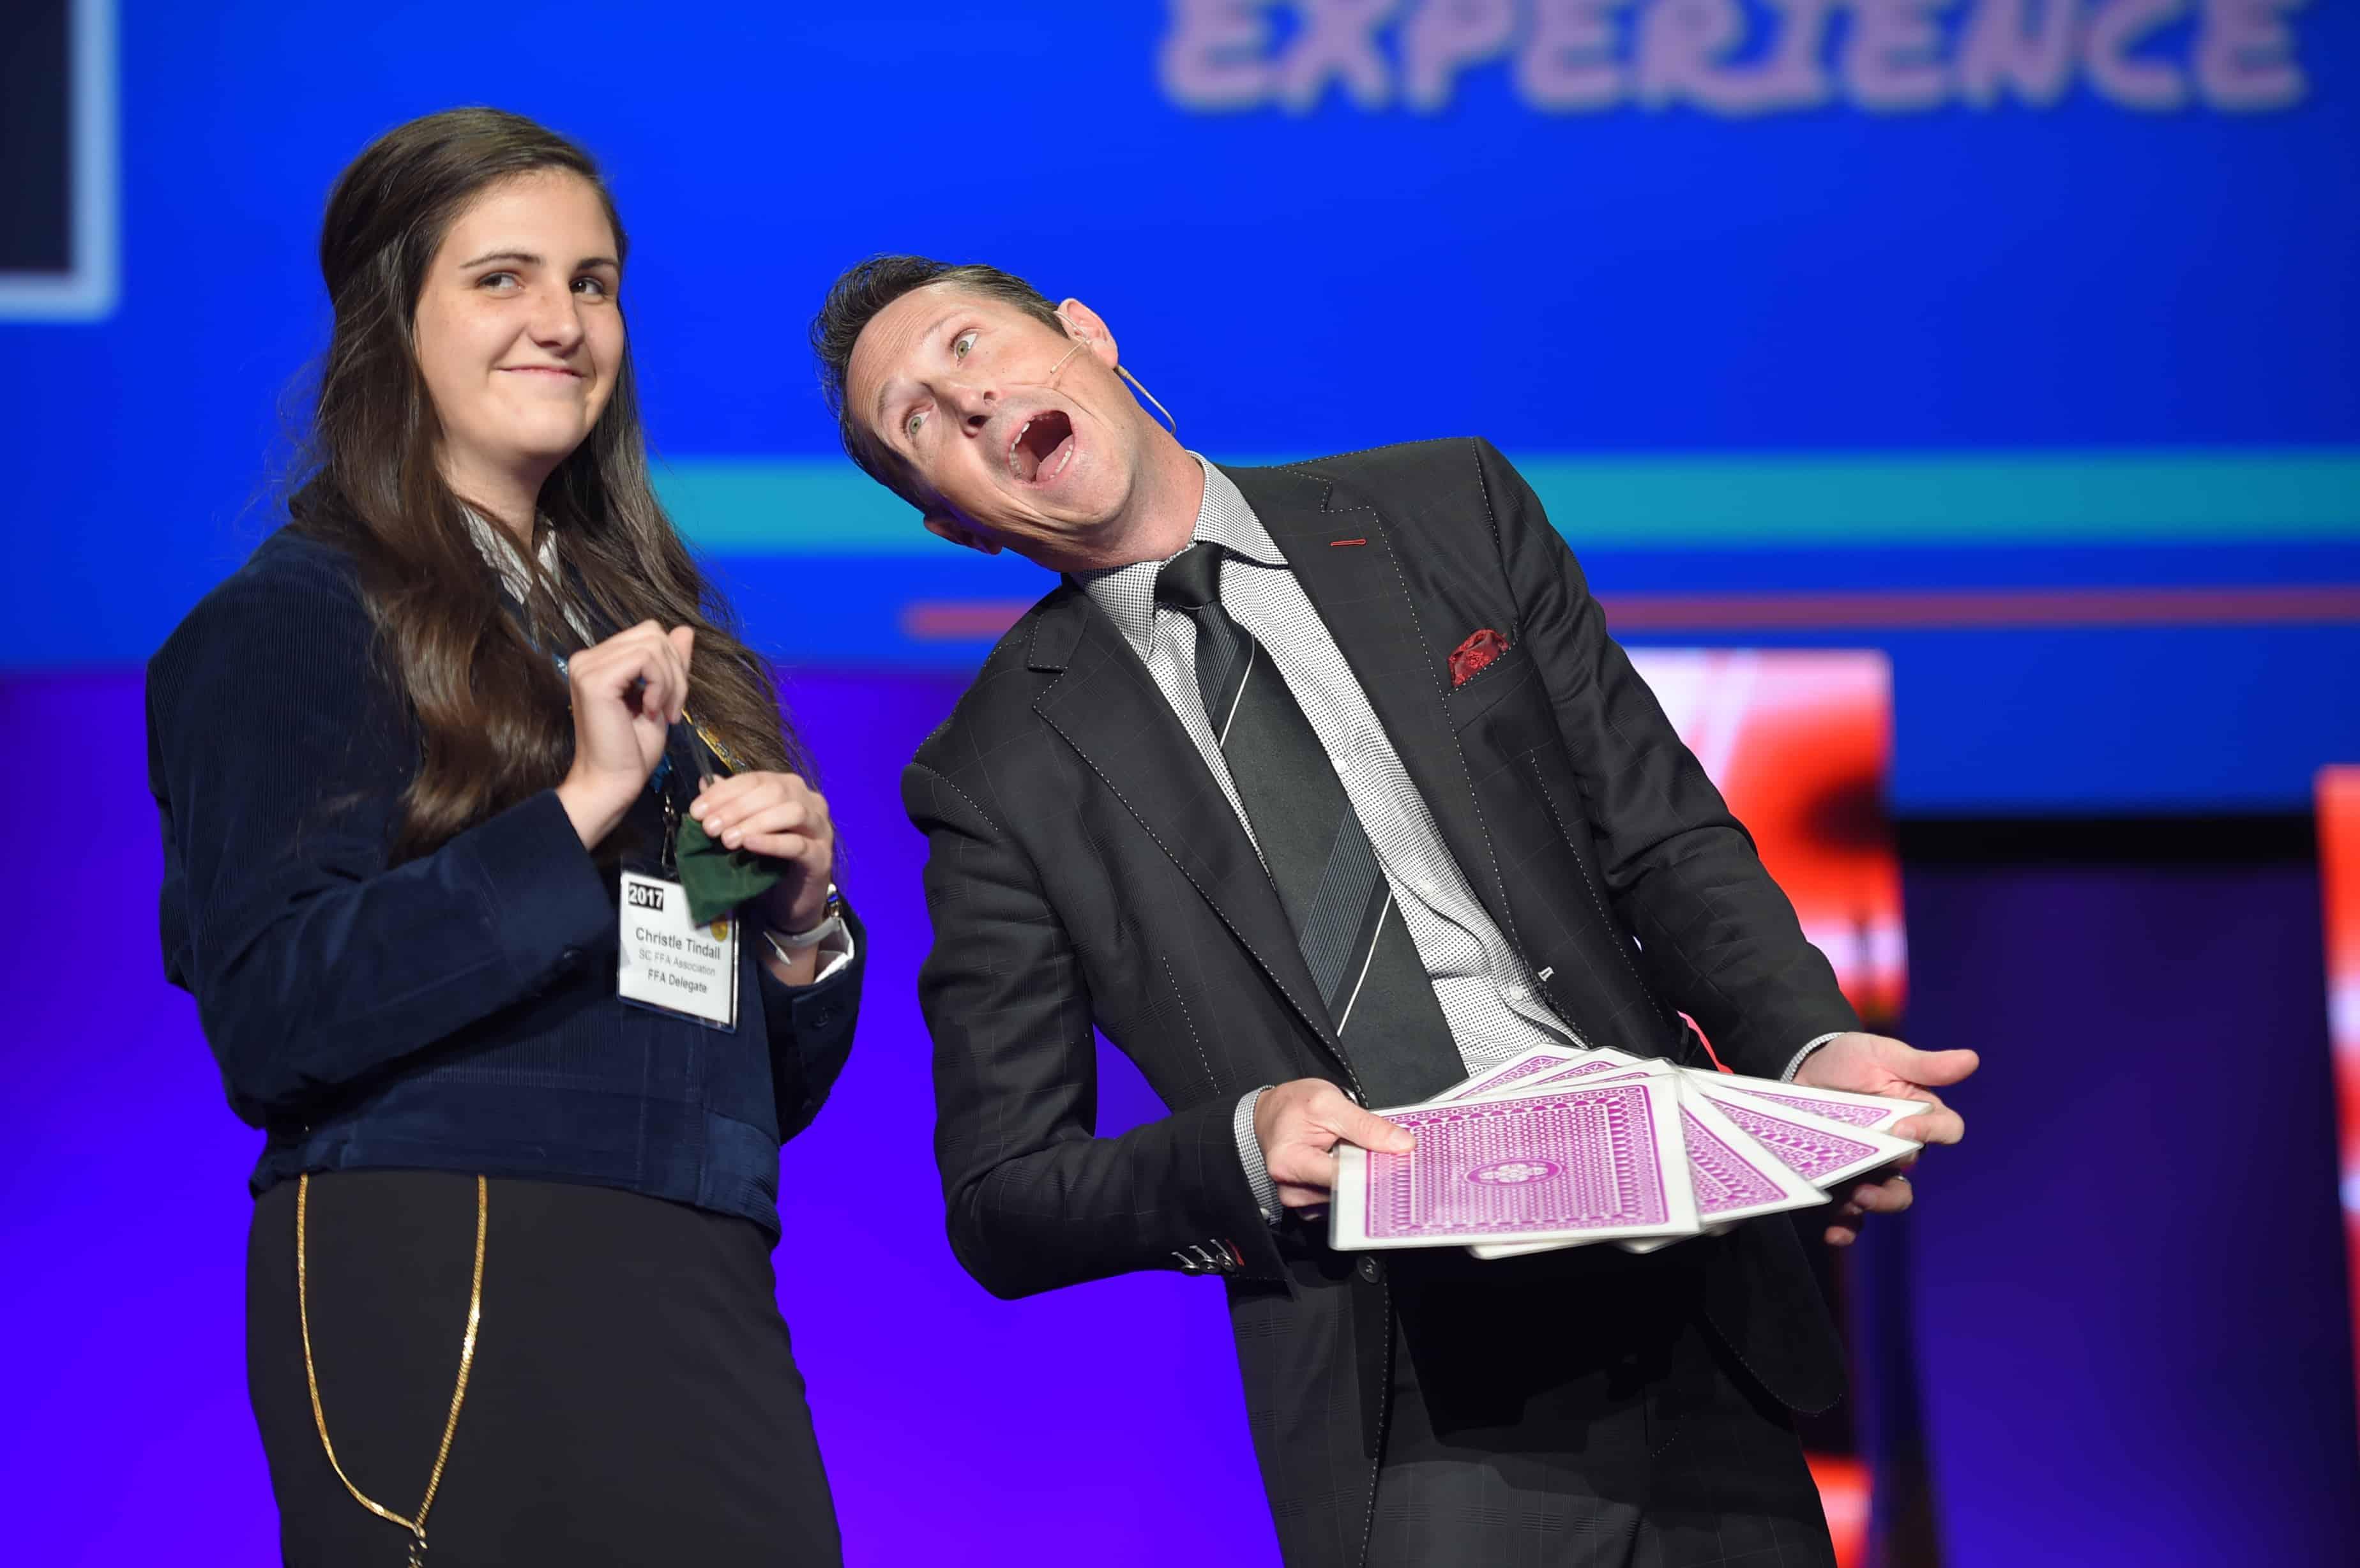 Make It Happen: Keynote Speaker Jon Petz Energizes FFA Members to Make an Impact